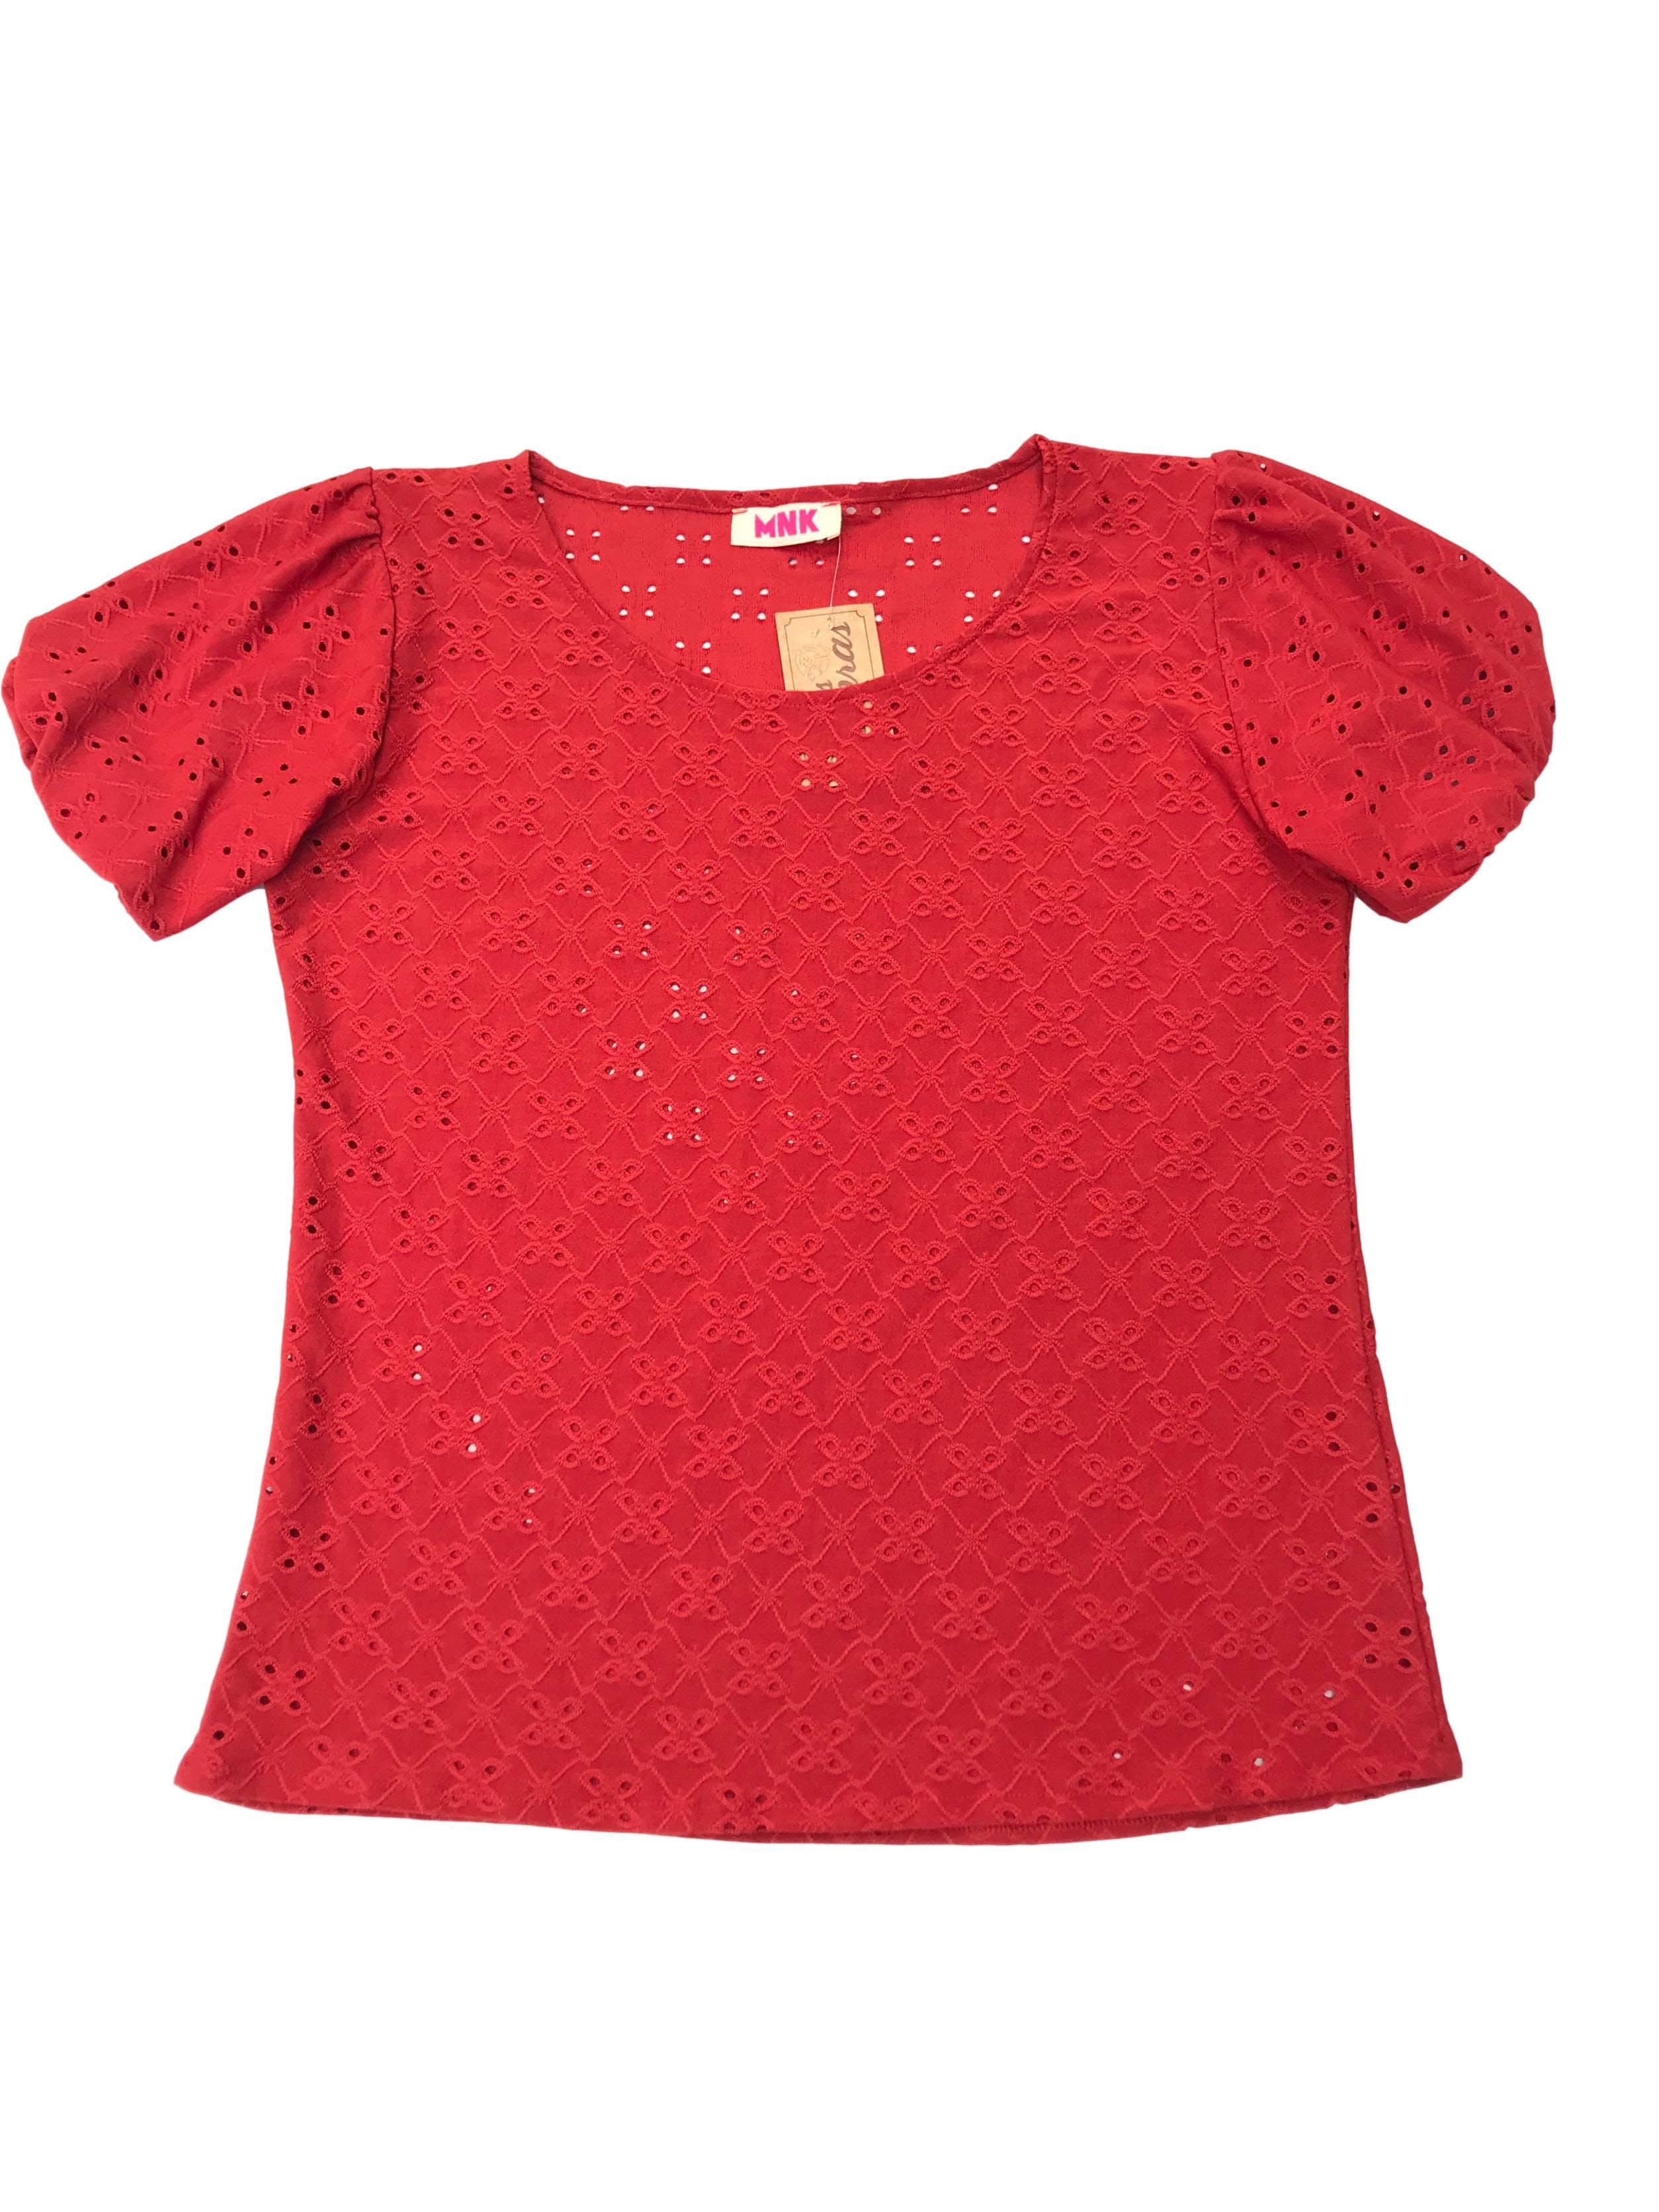 Blusa anaranjada stretch con manga corta bombacha y detalles calados.